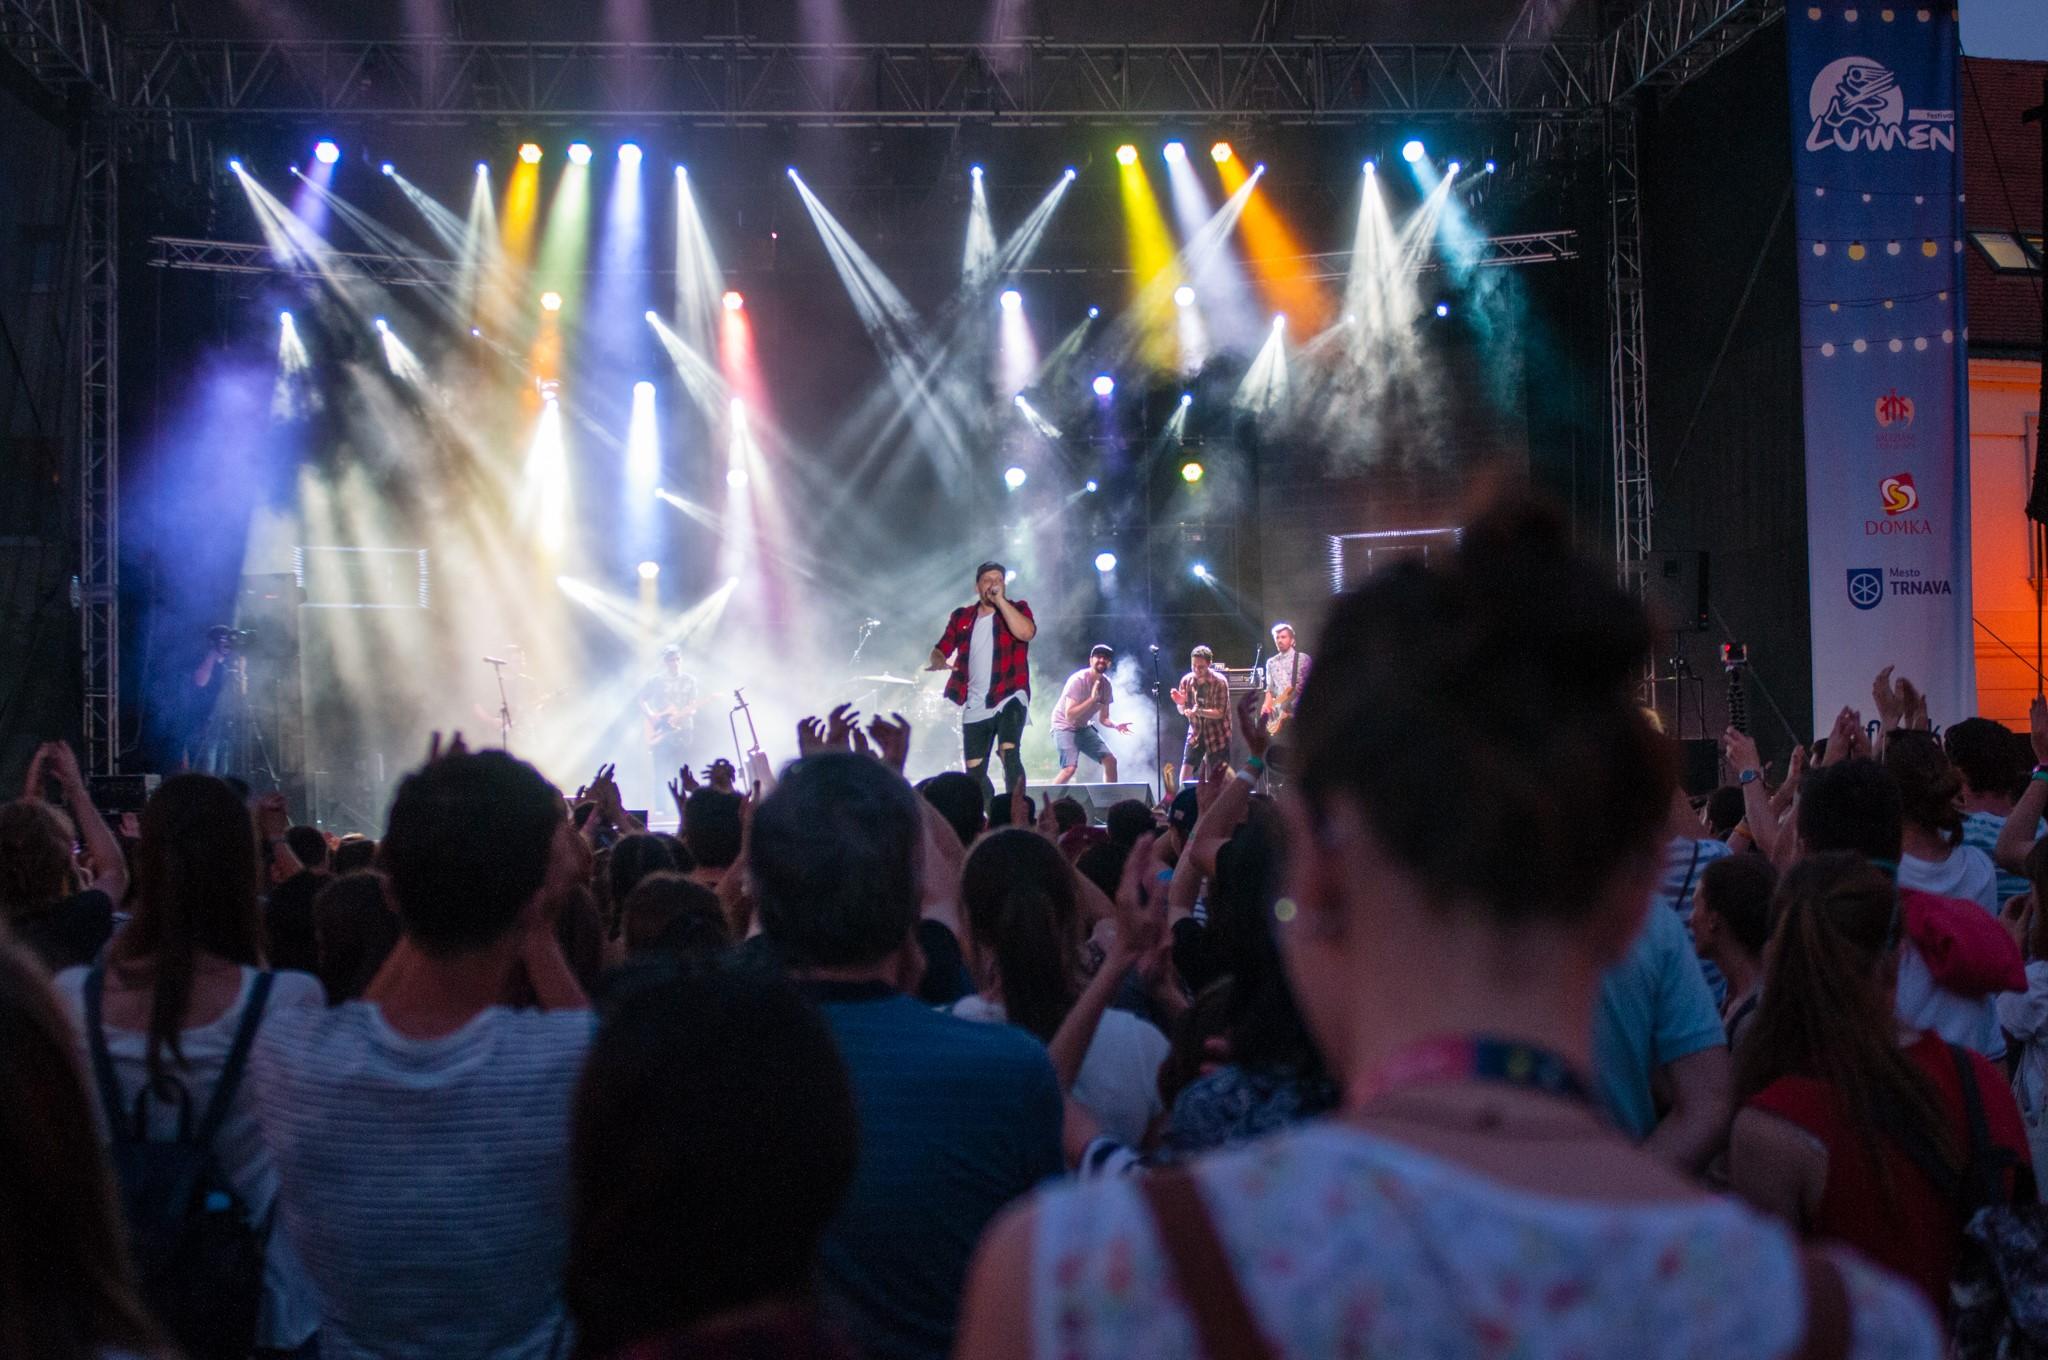 Ponuka tohtoročného Festivalu Lumen stále narastá